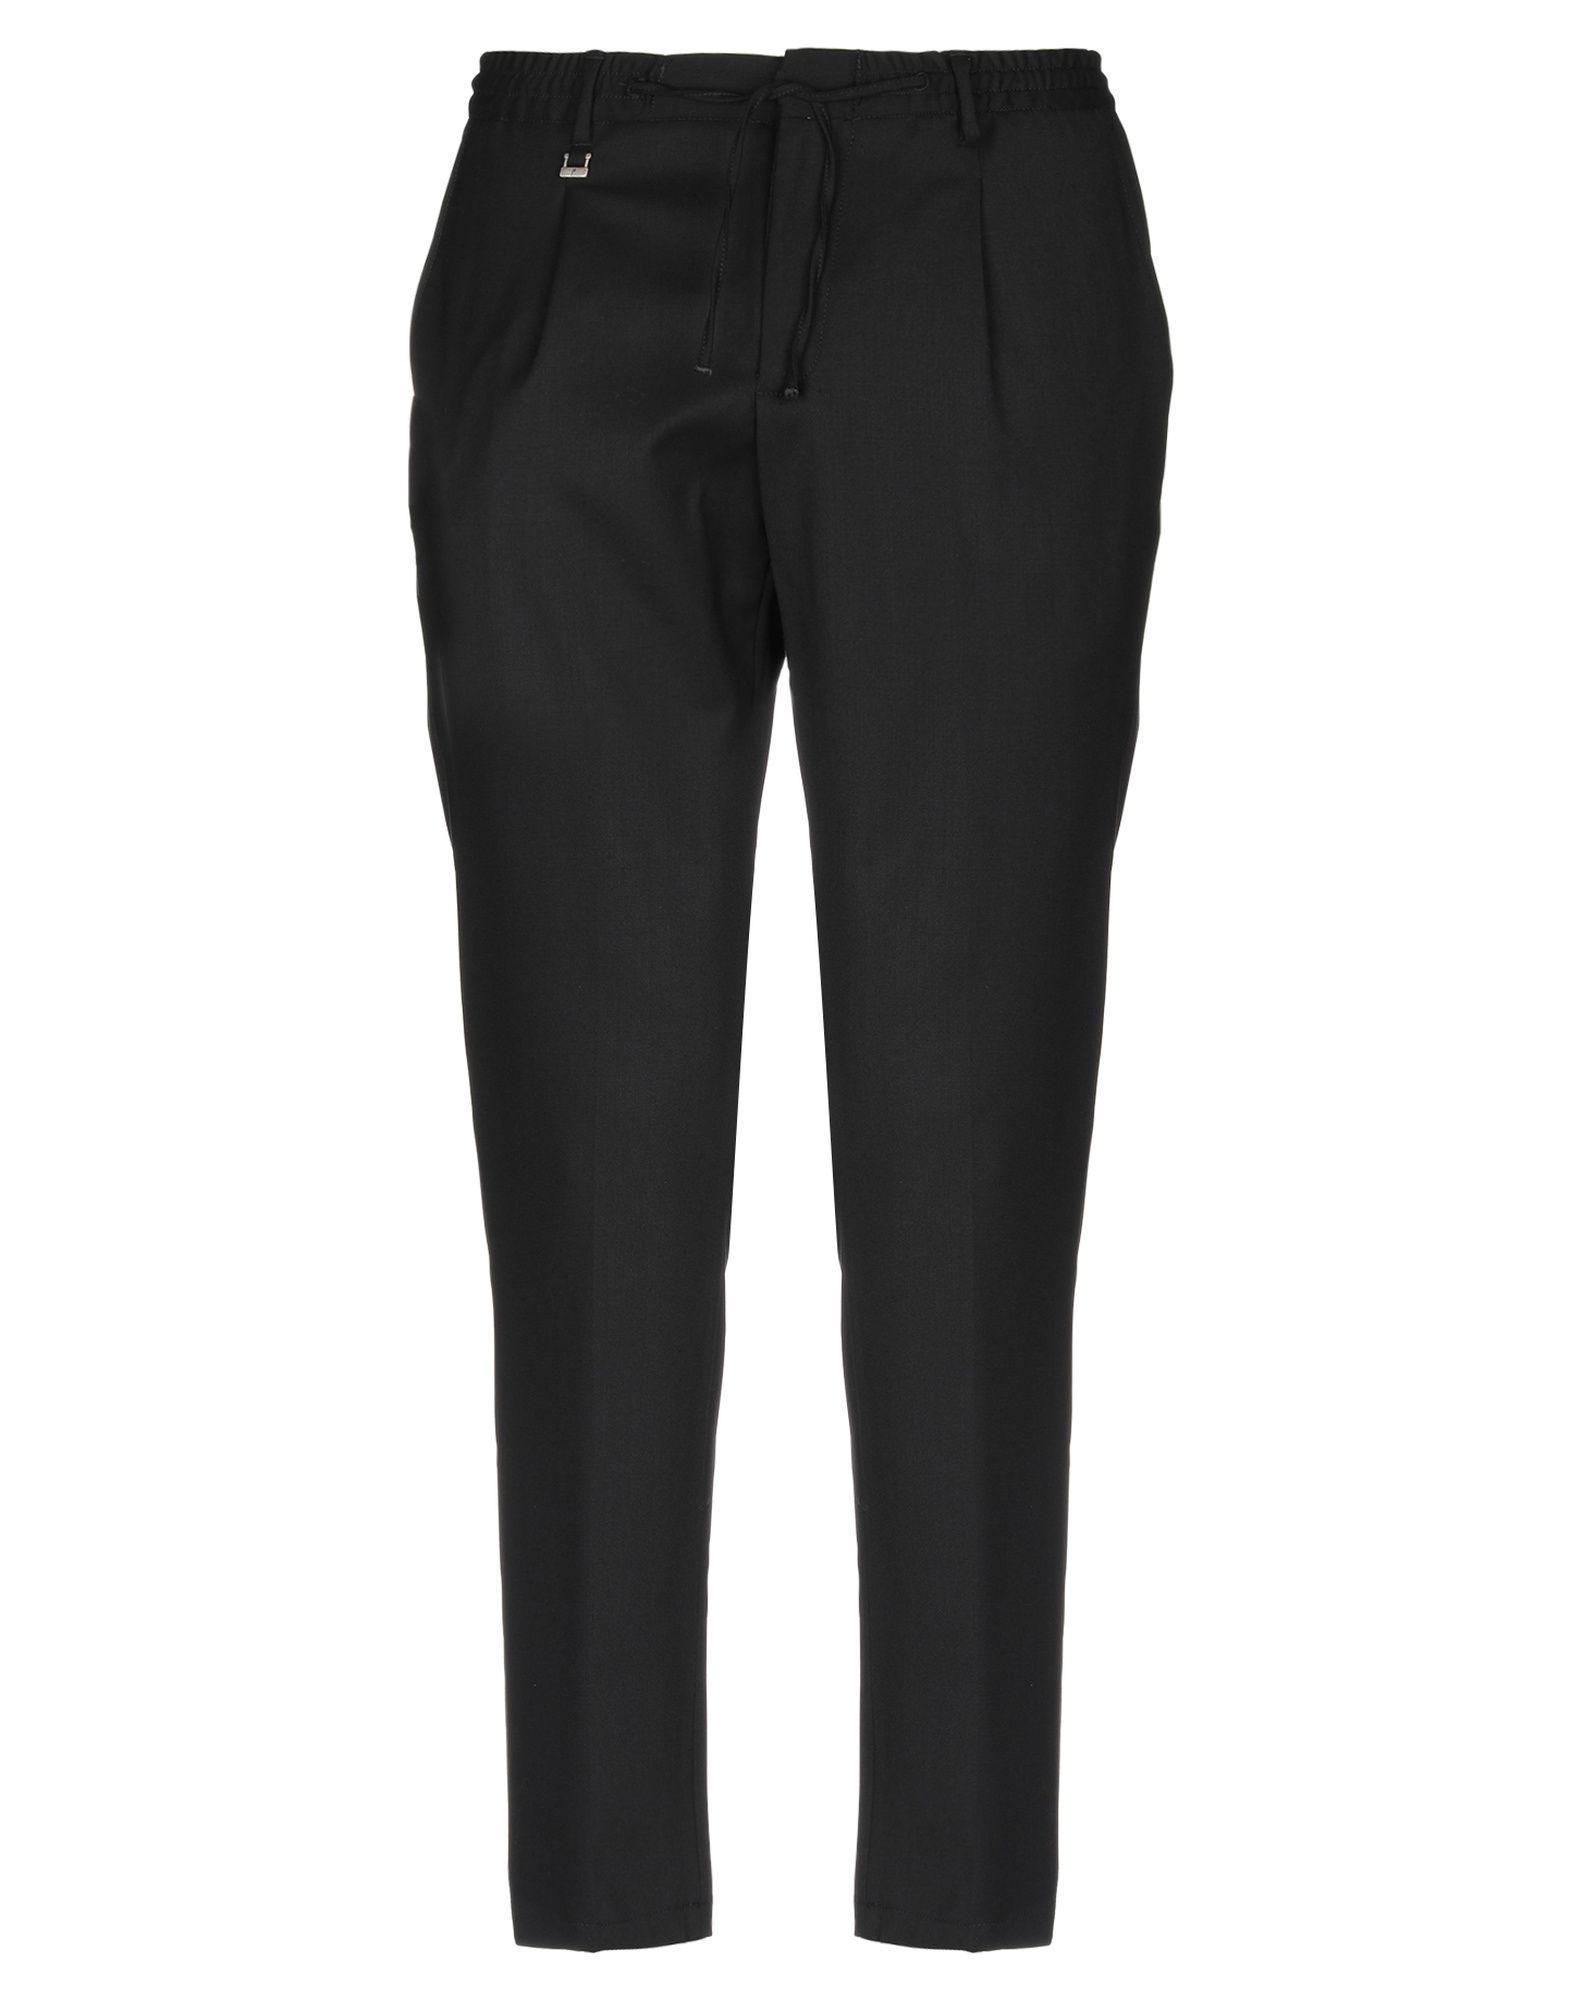 ebf54a3d8d3ae60 PAOLONI Повседневные брюки